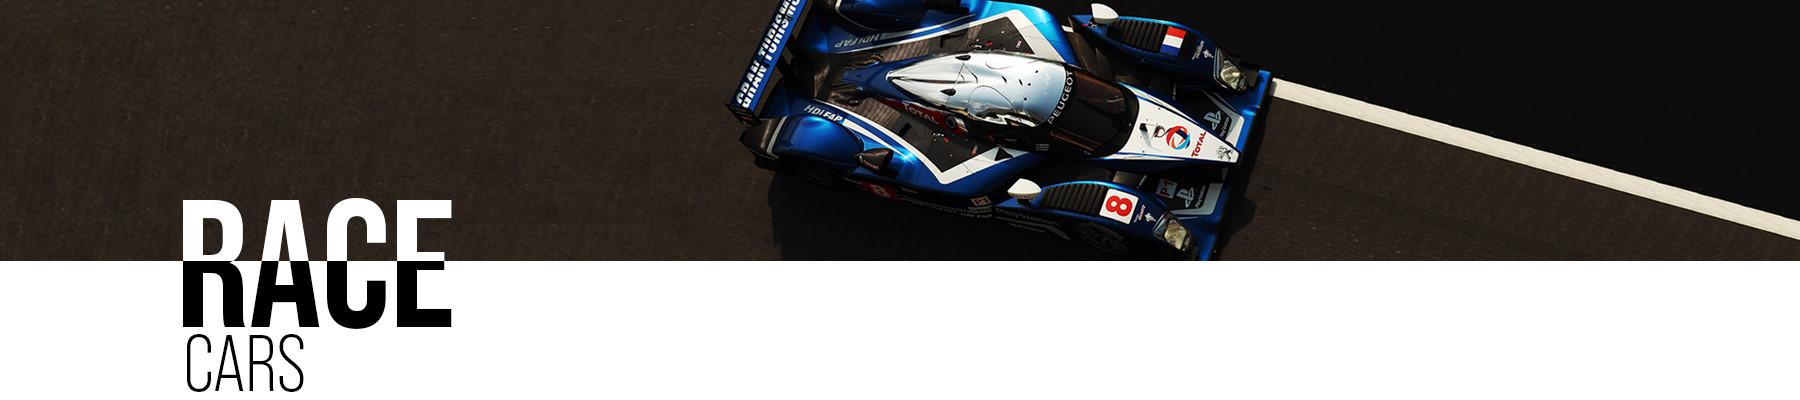 Race cars for sale header - Racing Edge